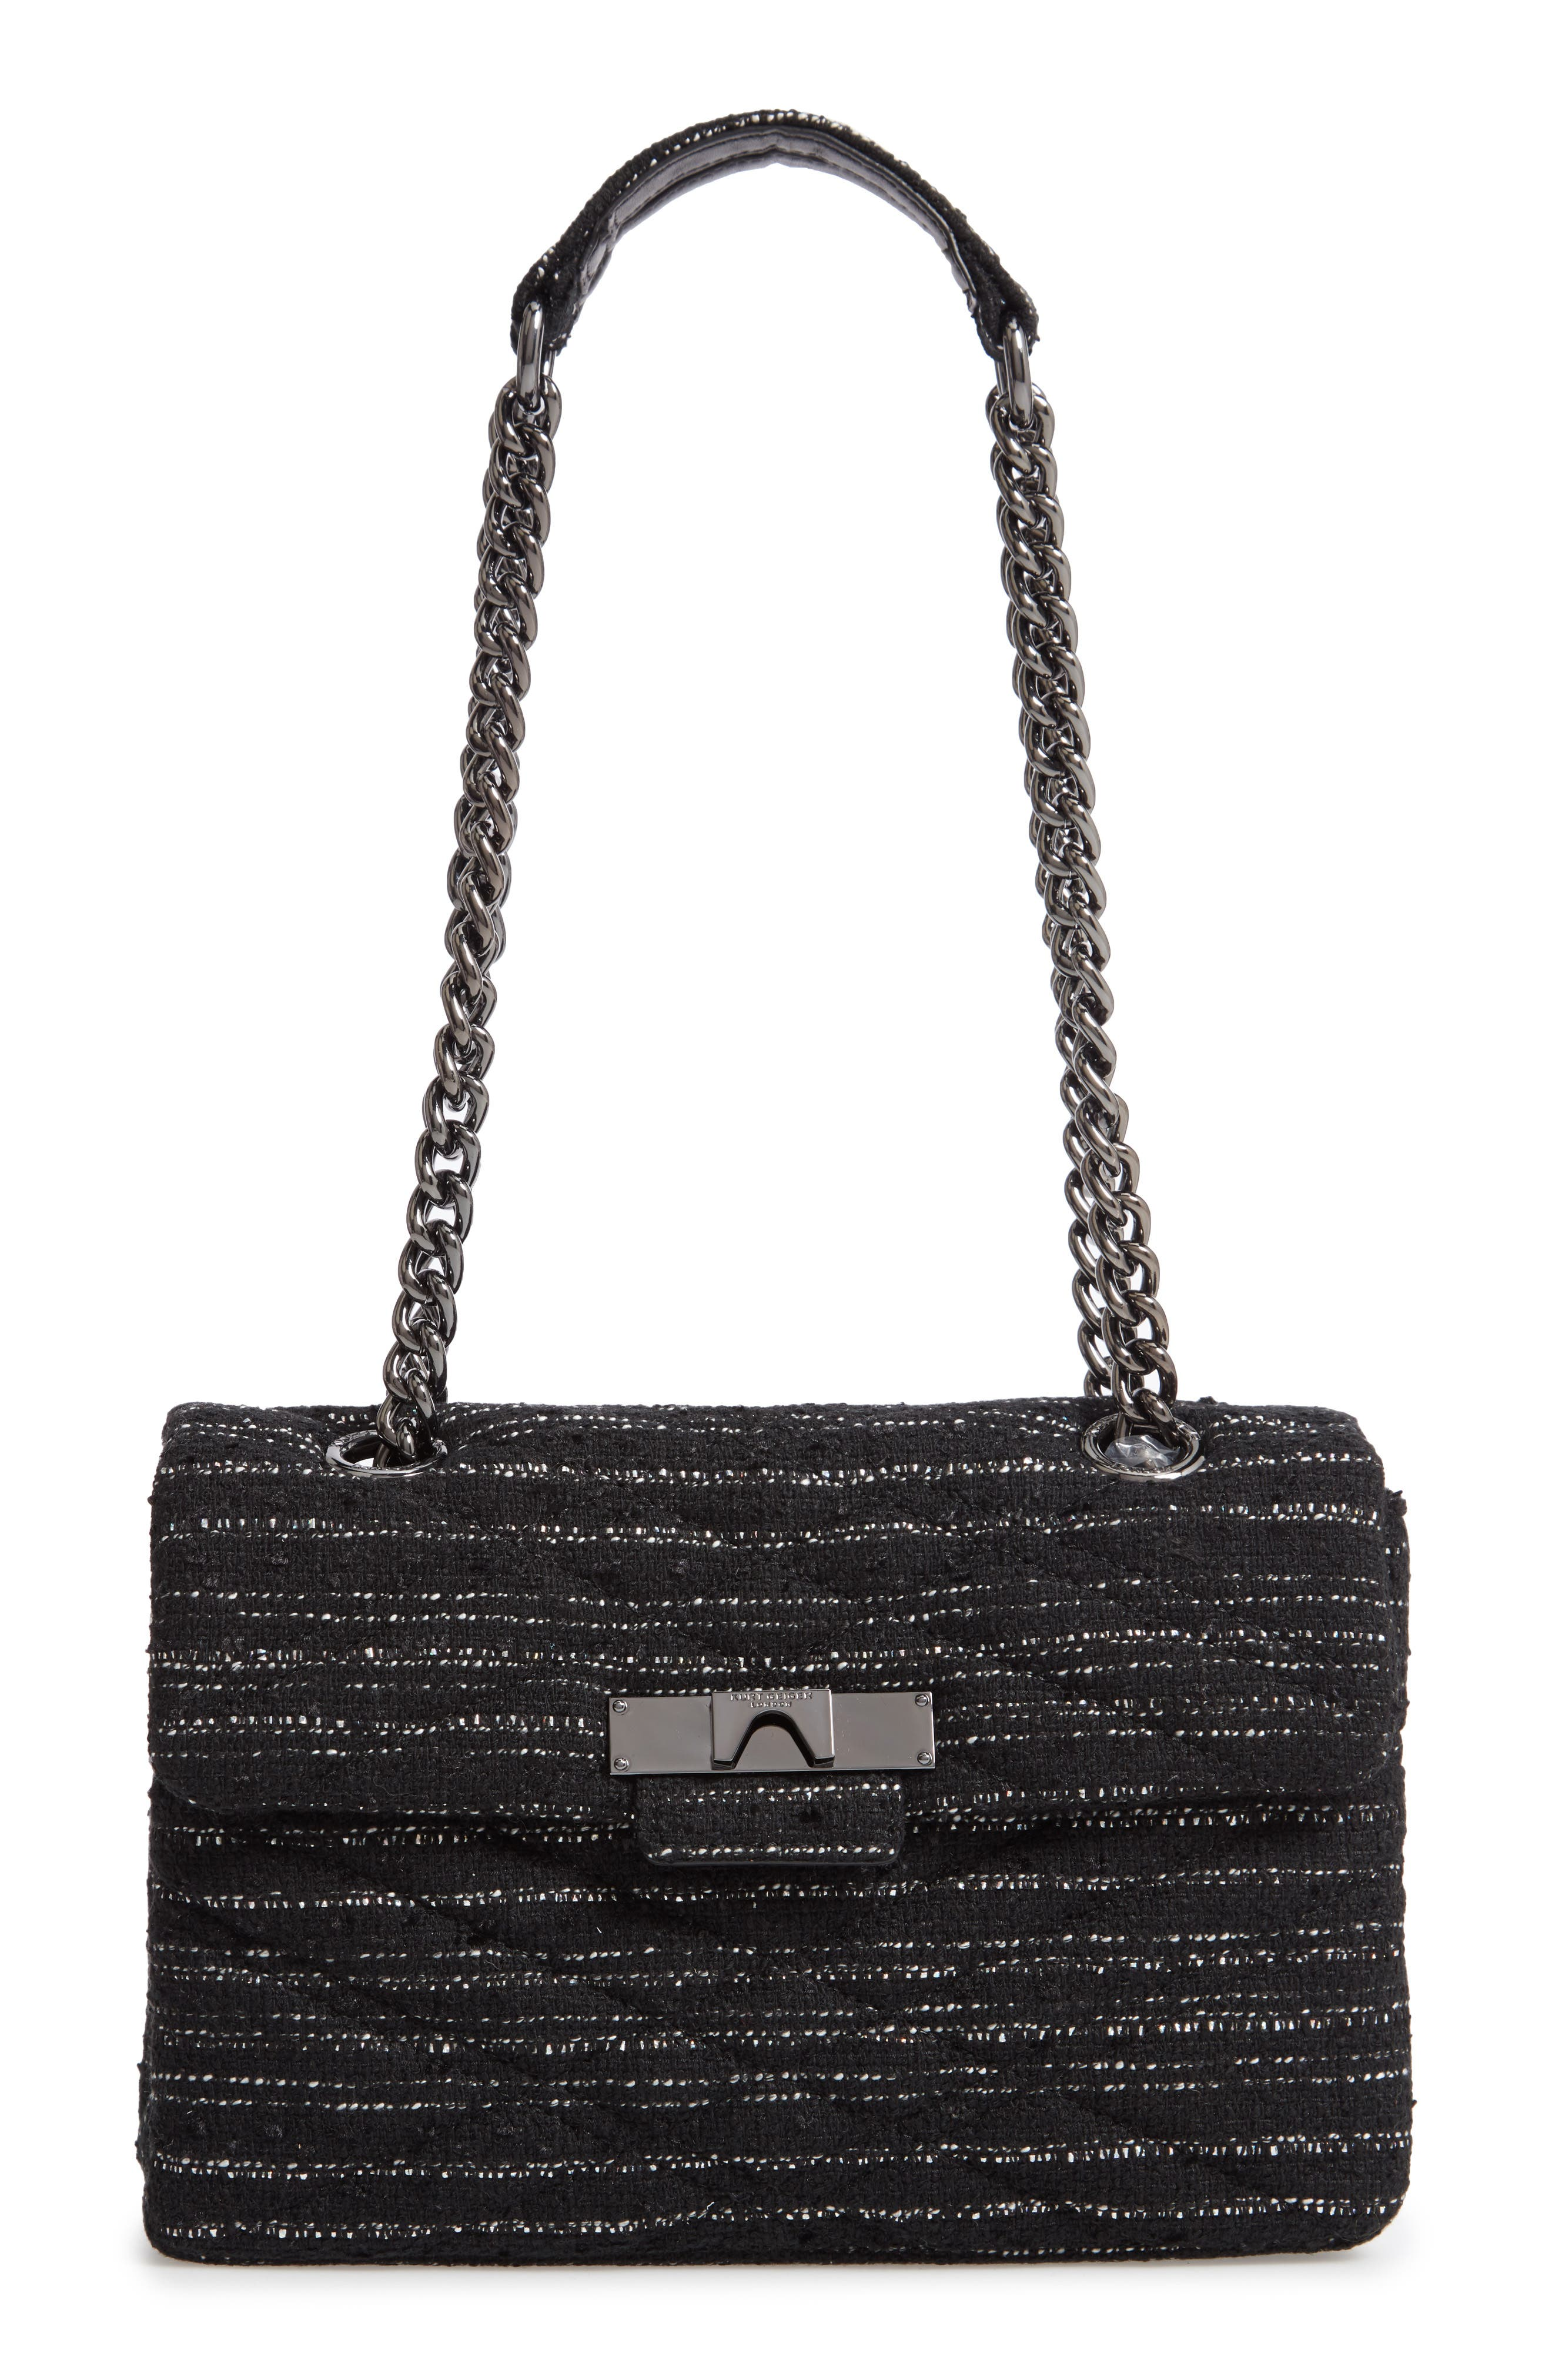 Mayfair Quilted Tweed Shoulder Bag,                             Main thumbnail 1, color,                             BLACK